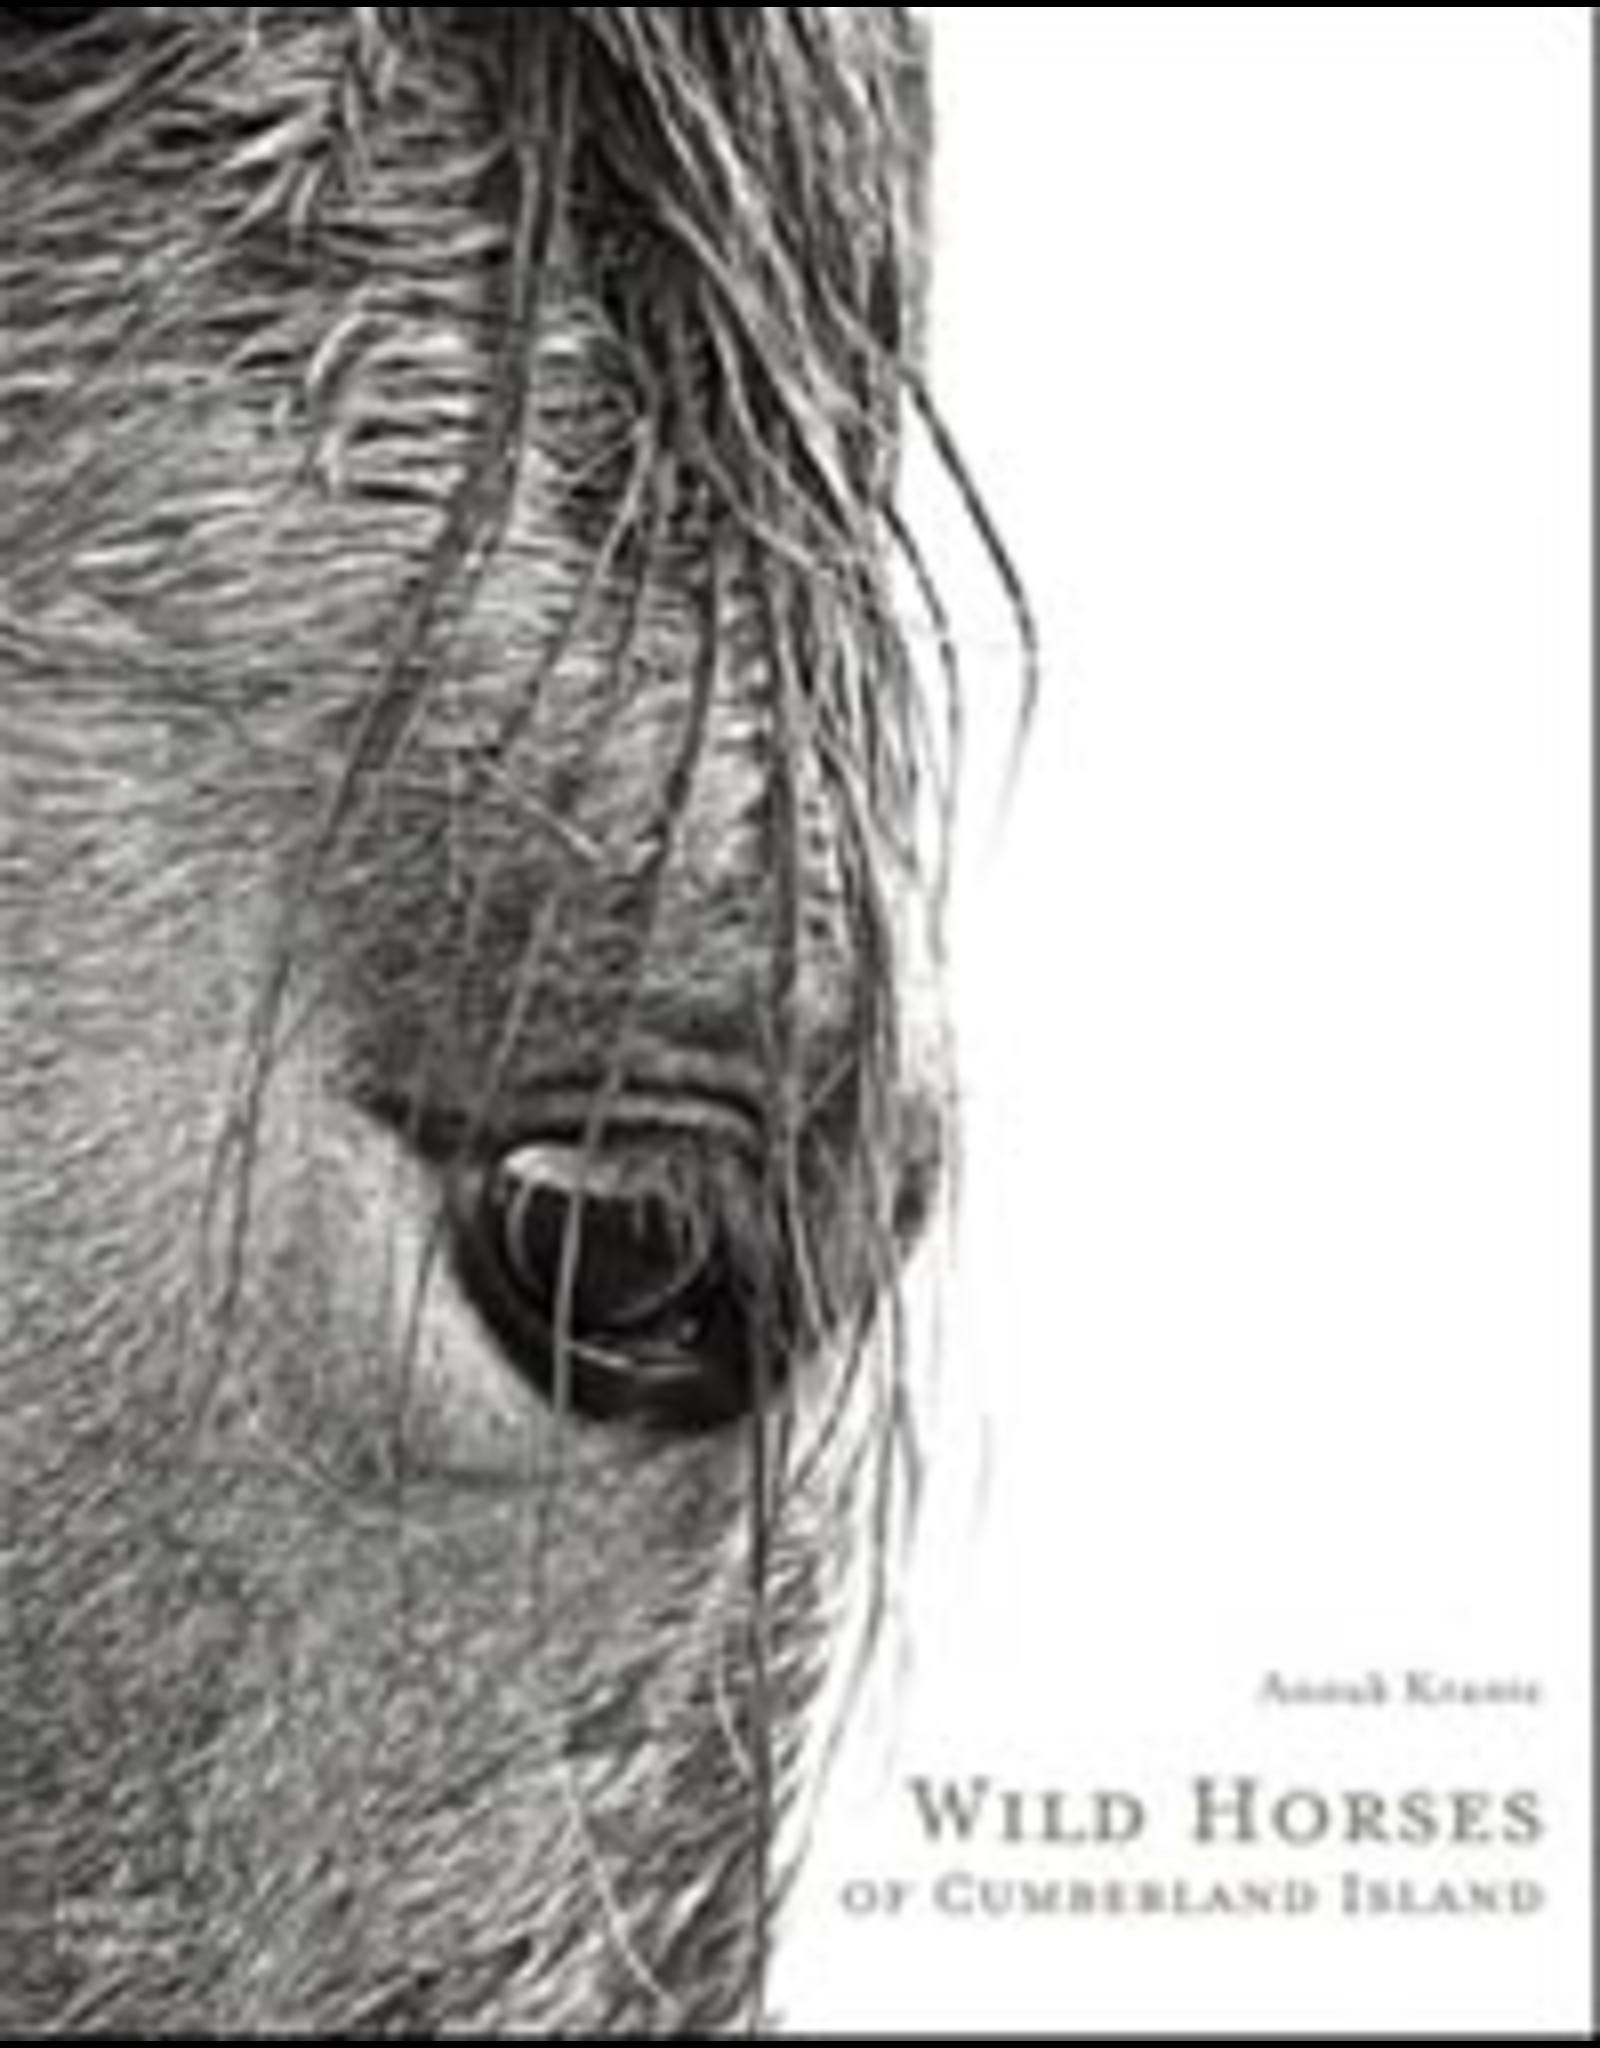 Website Wild Horses of Cumberland Island